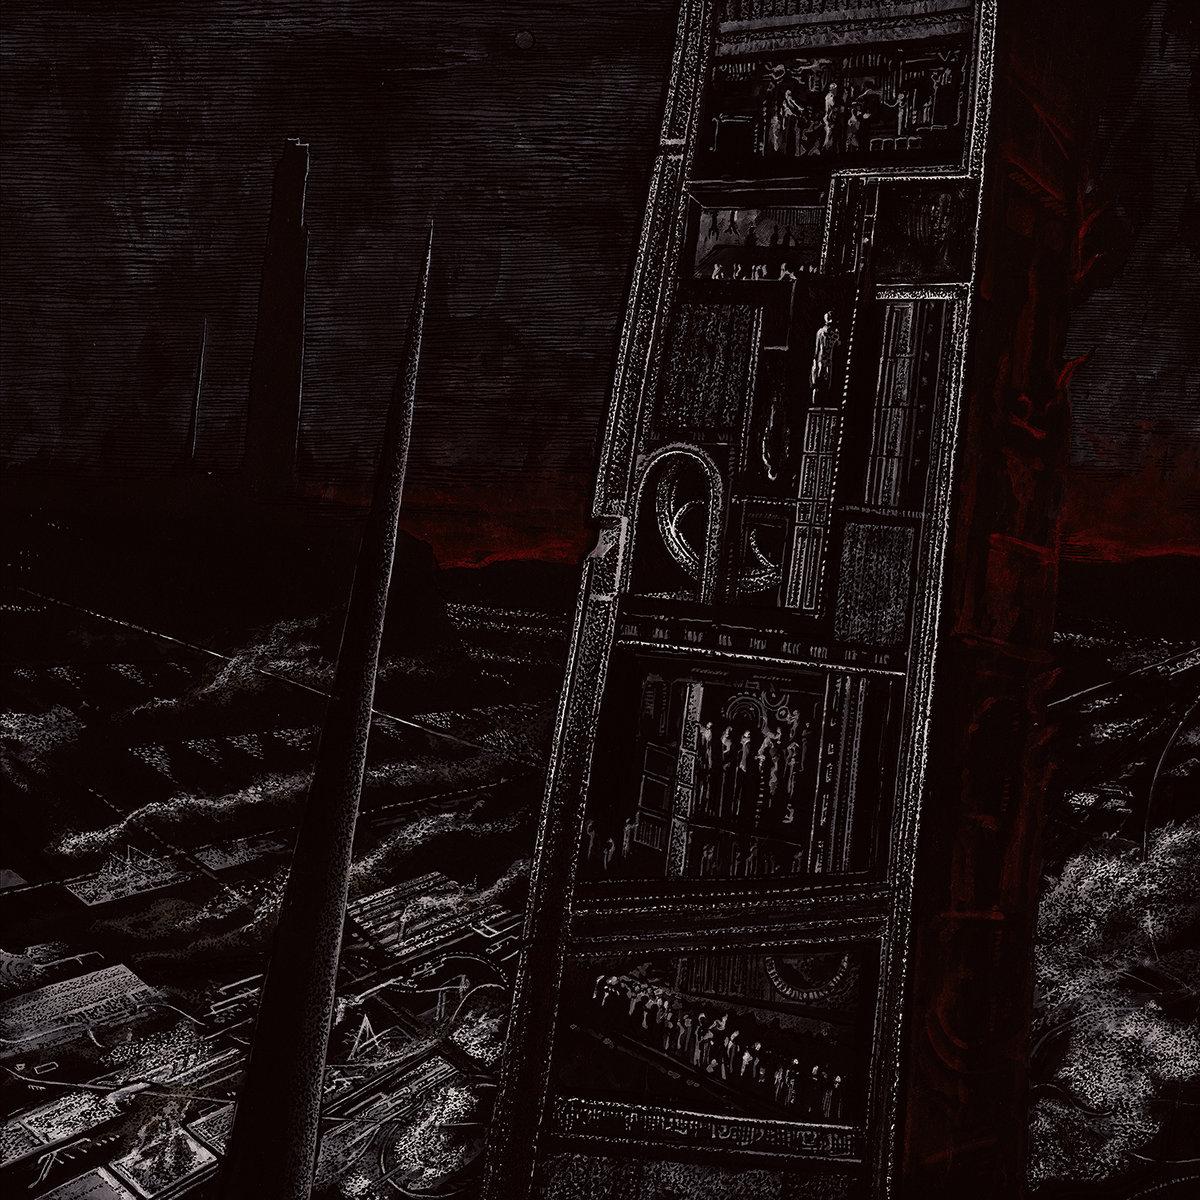 Deathspell Omega - The Furnaces of Palingenesia